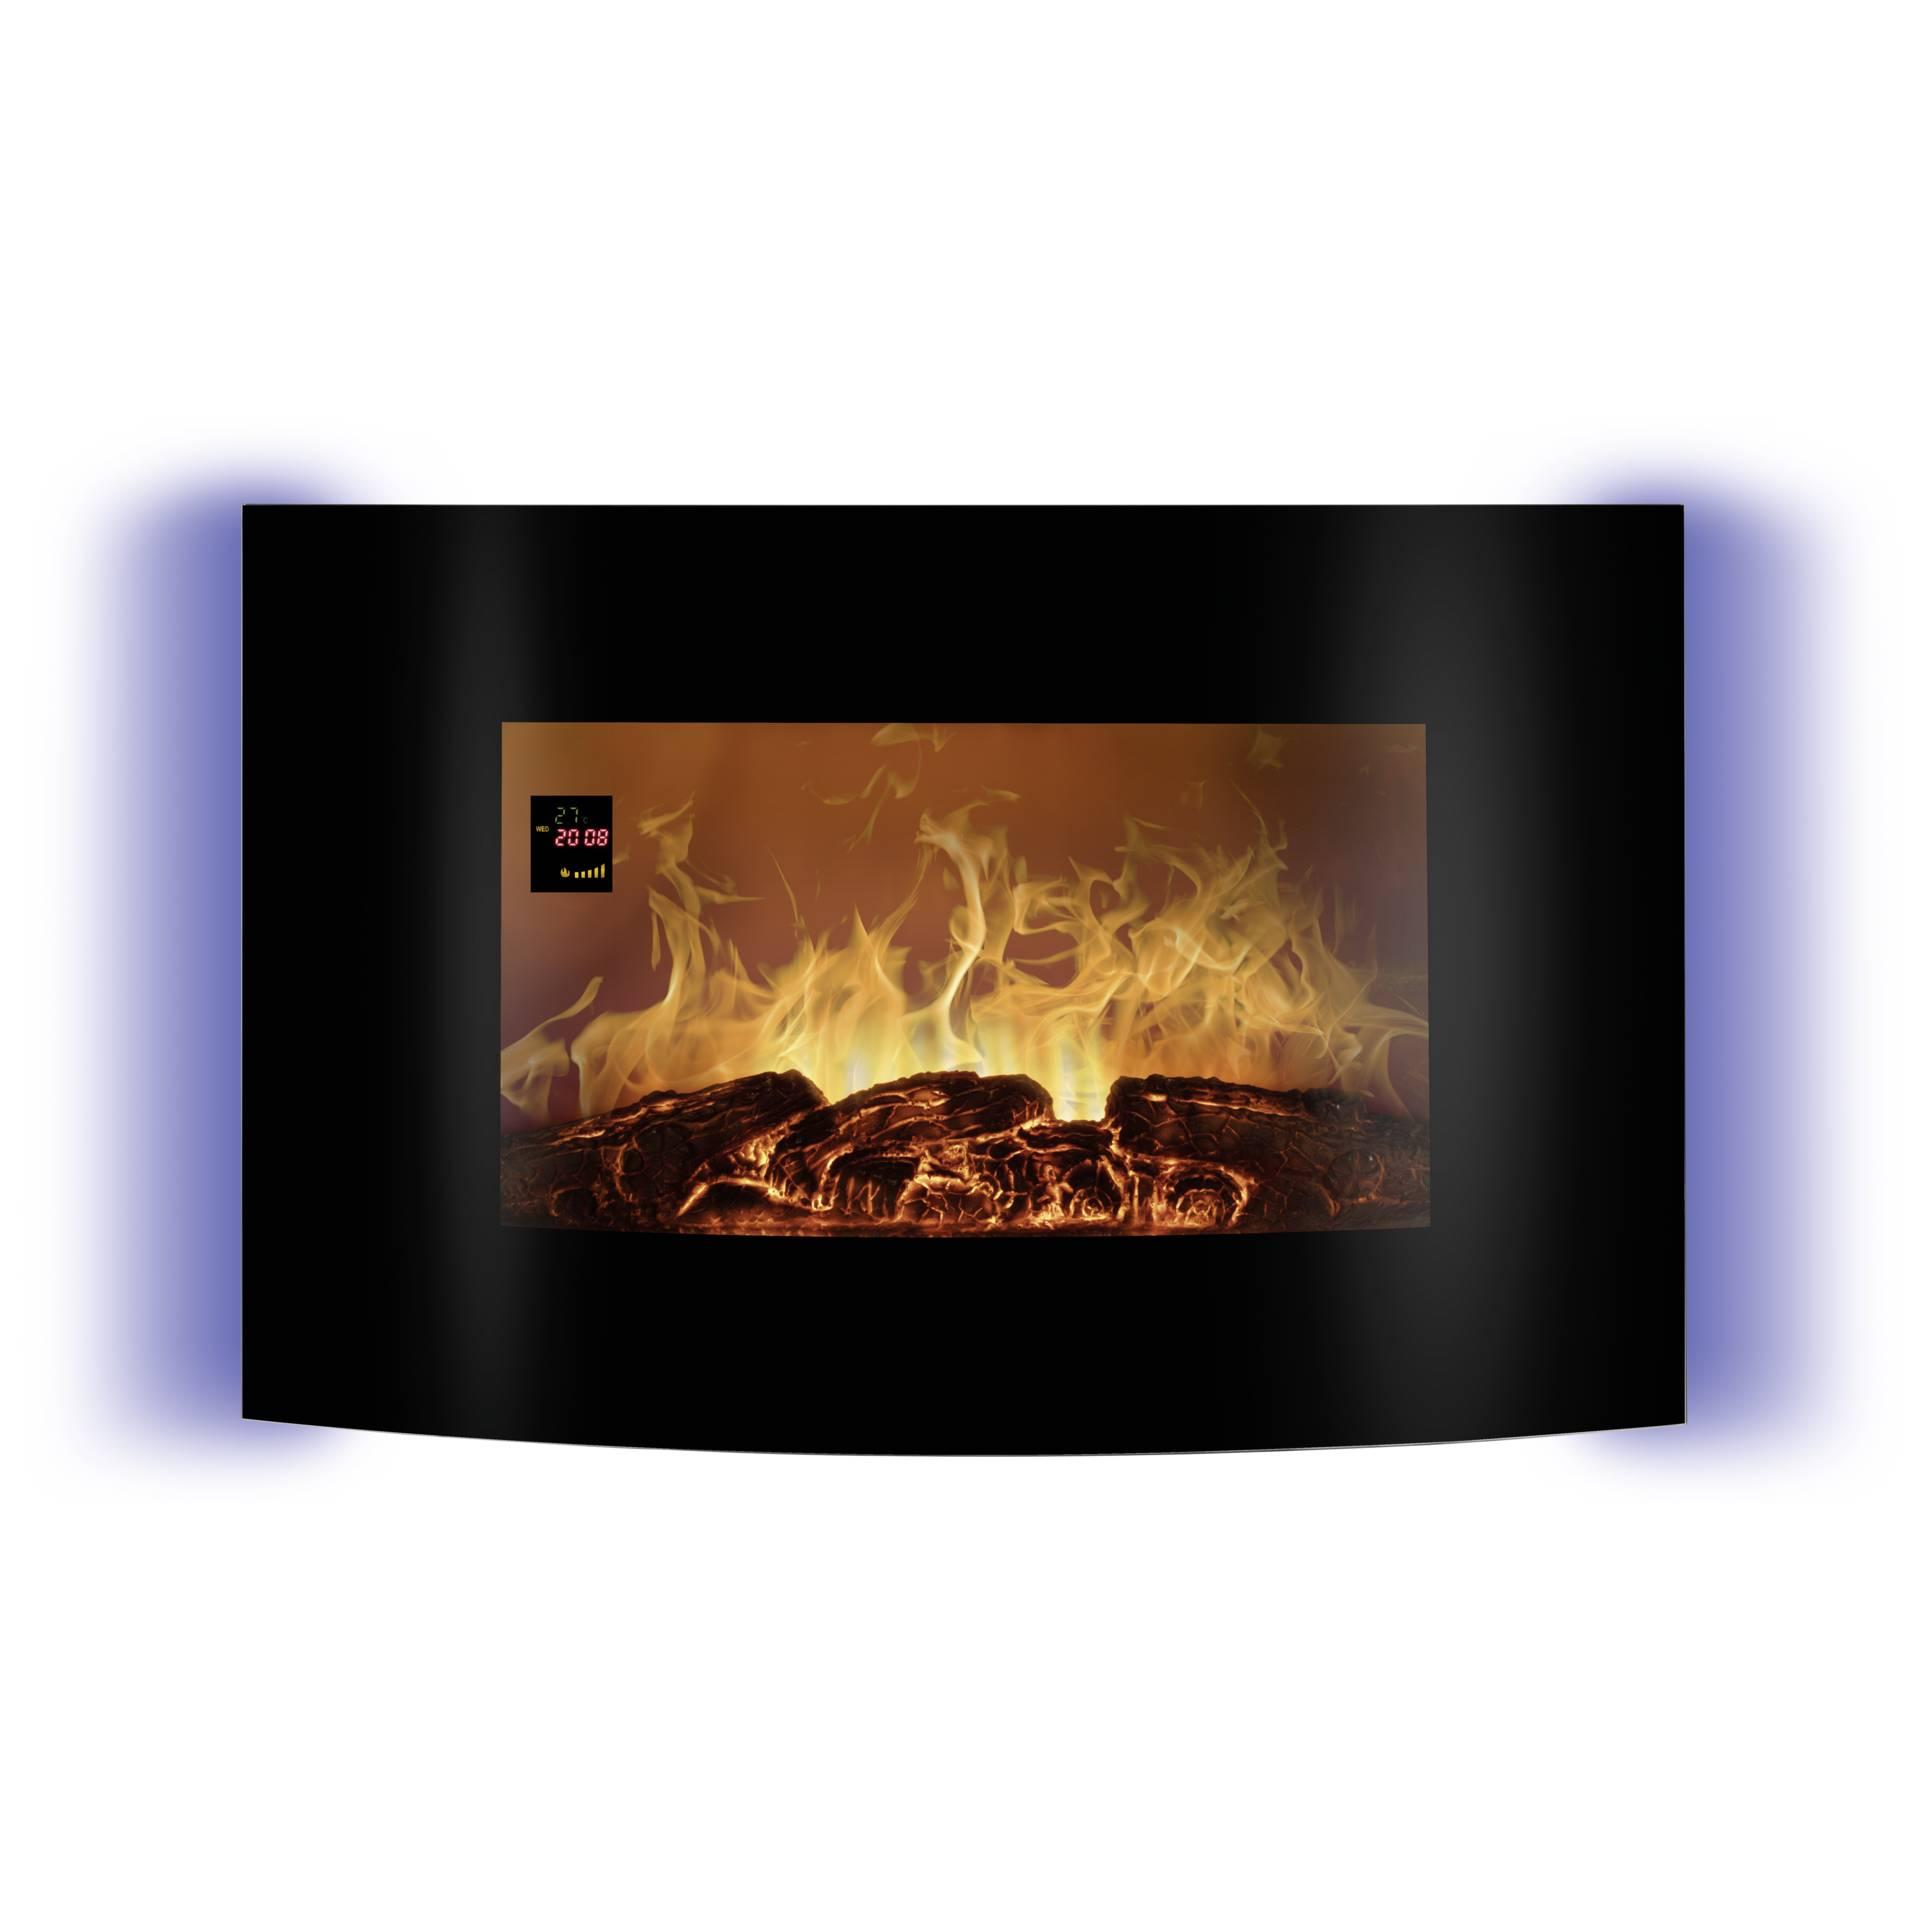 Fireplace Heater Inspirational Bomann Ek 6021 Cb Black Electric Fireplace Heater